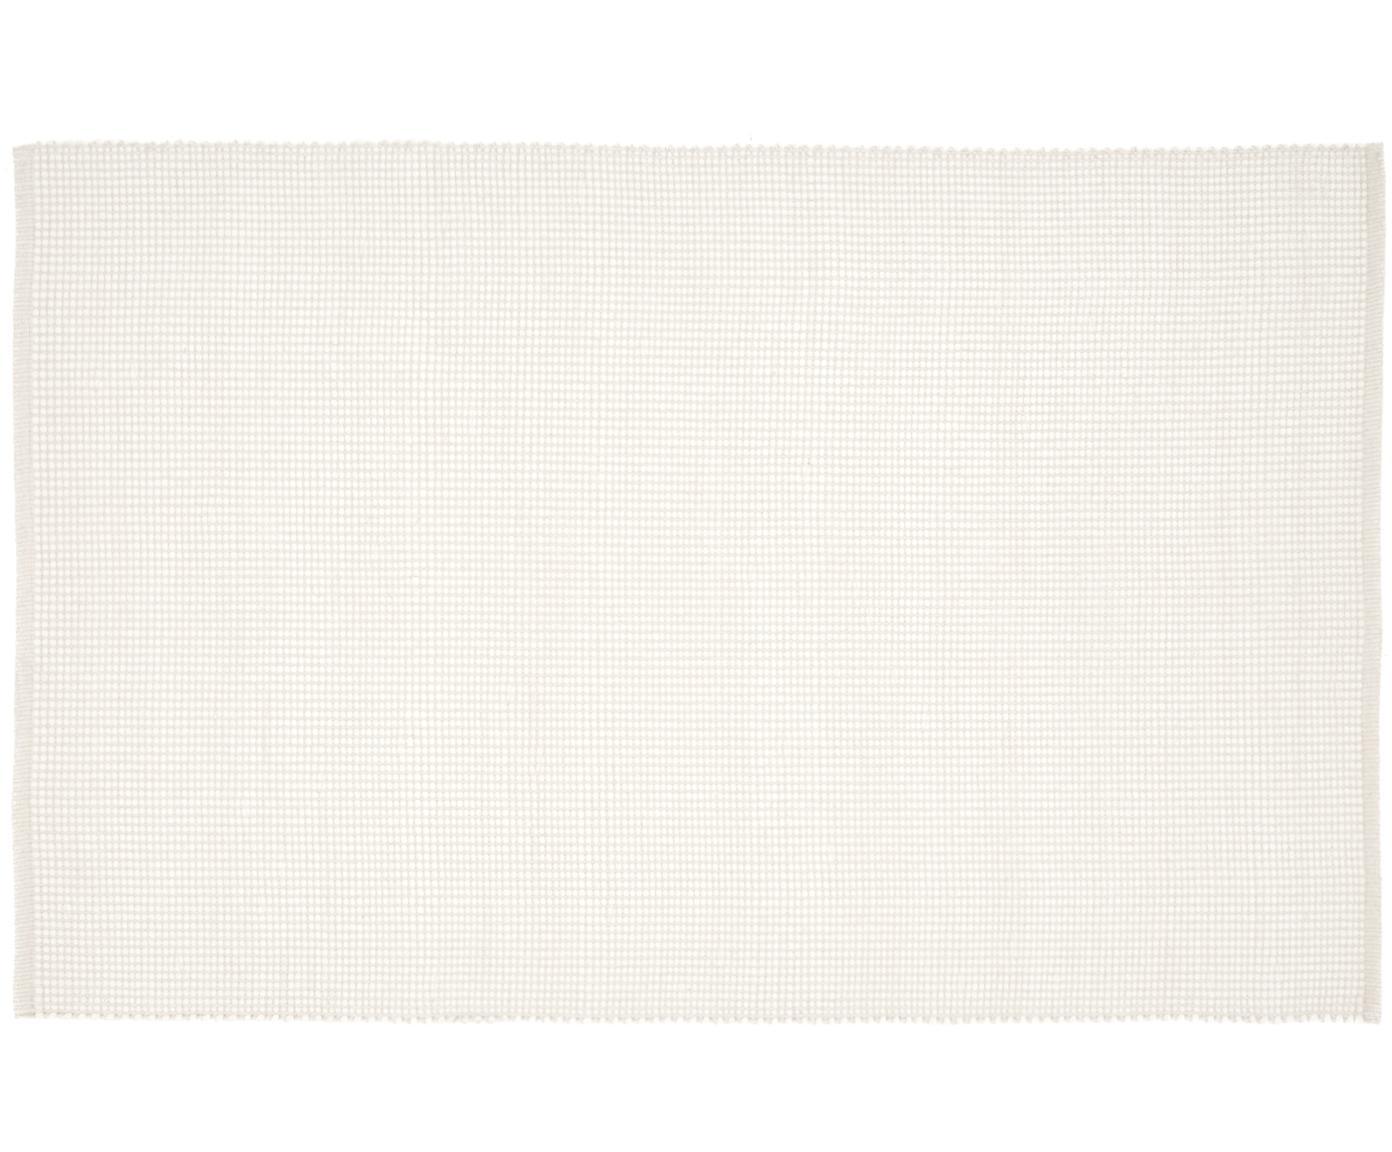 Alfombra artesanal de lana Amaro, 38%lana, 22%poliéster, 20%algodón, 20%poliamida, Blanco crema, An 120 x L 180 cm (Tamaño S)